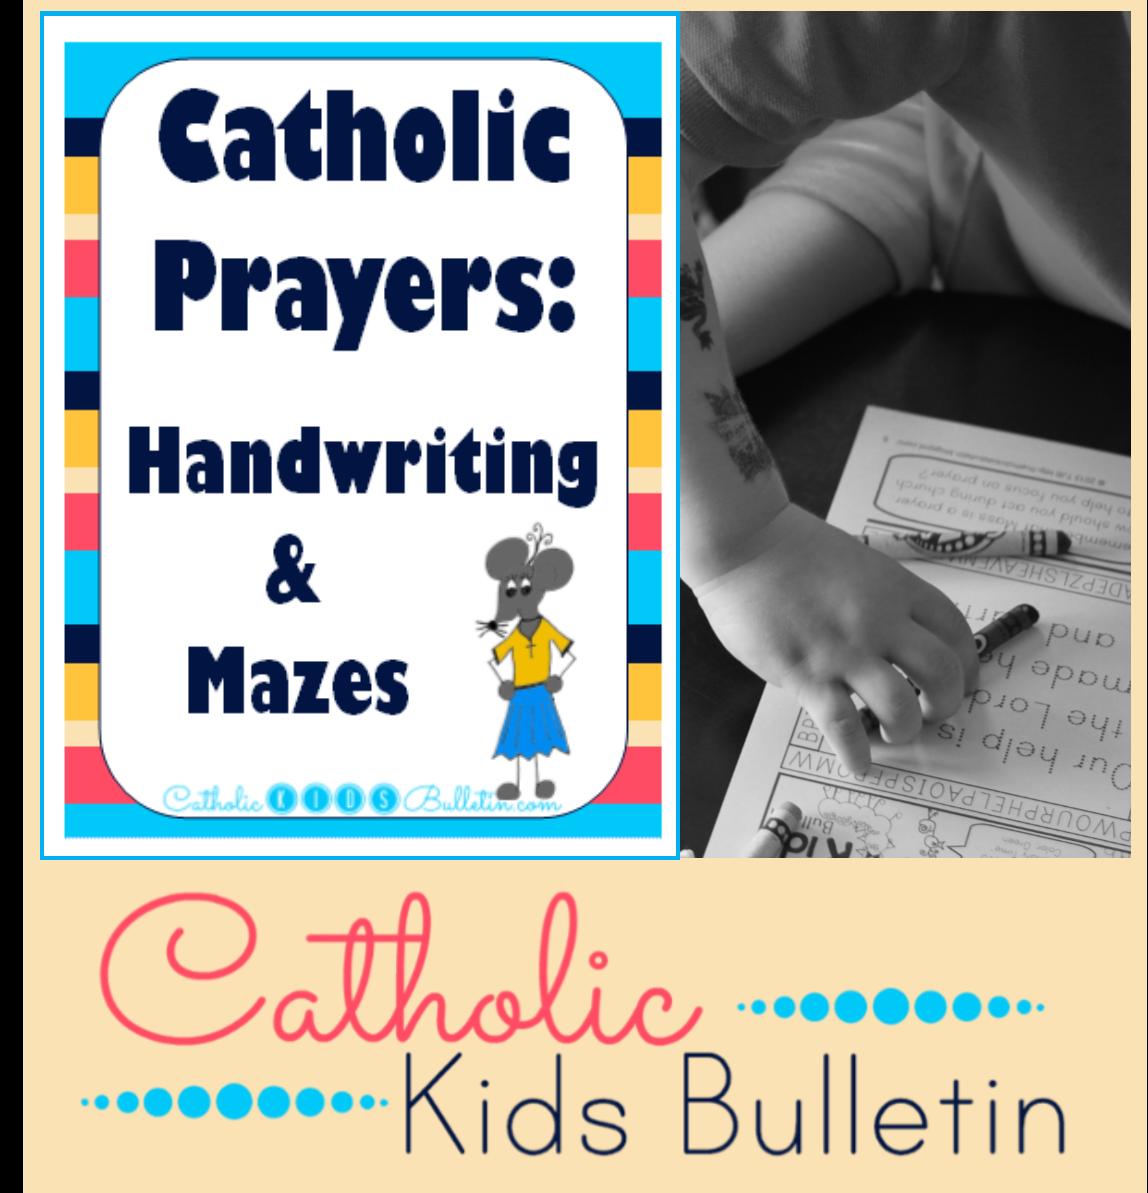 Catholic Kids Updates From Catholic Kids Bulletin Seven Quick Takes 11